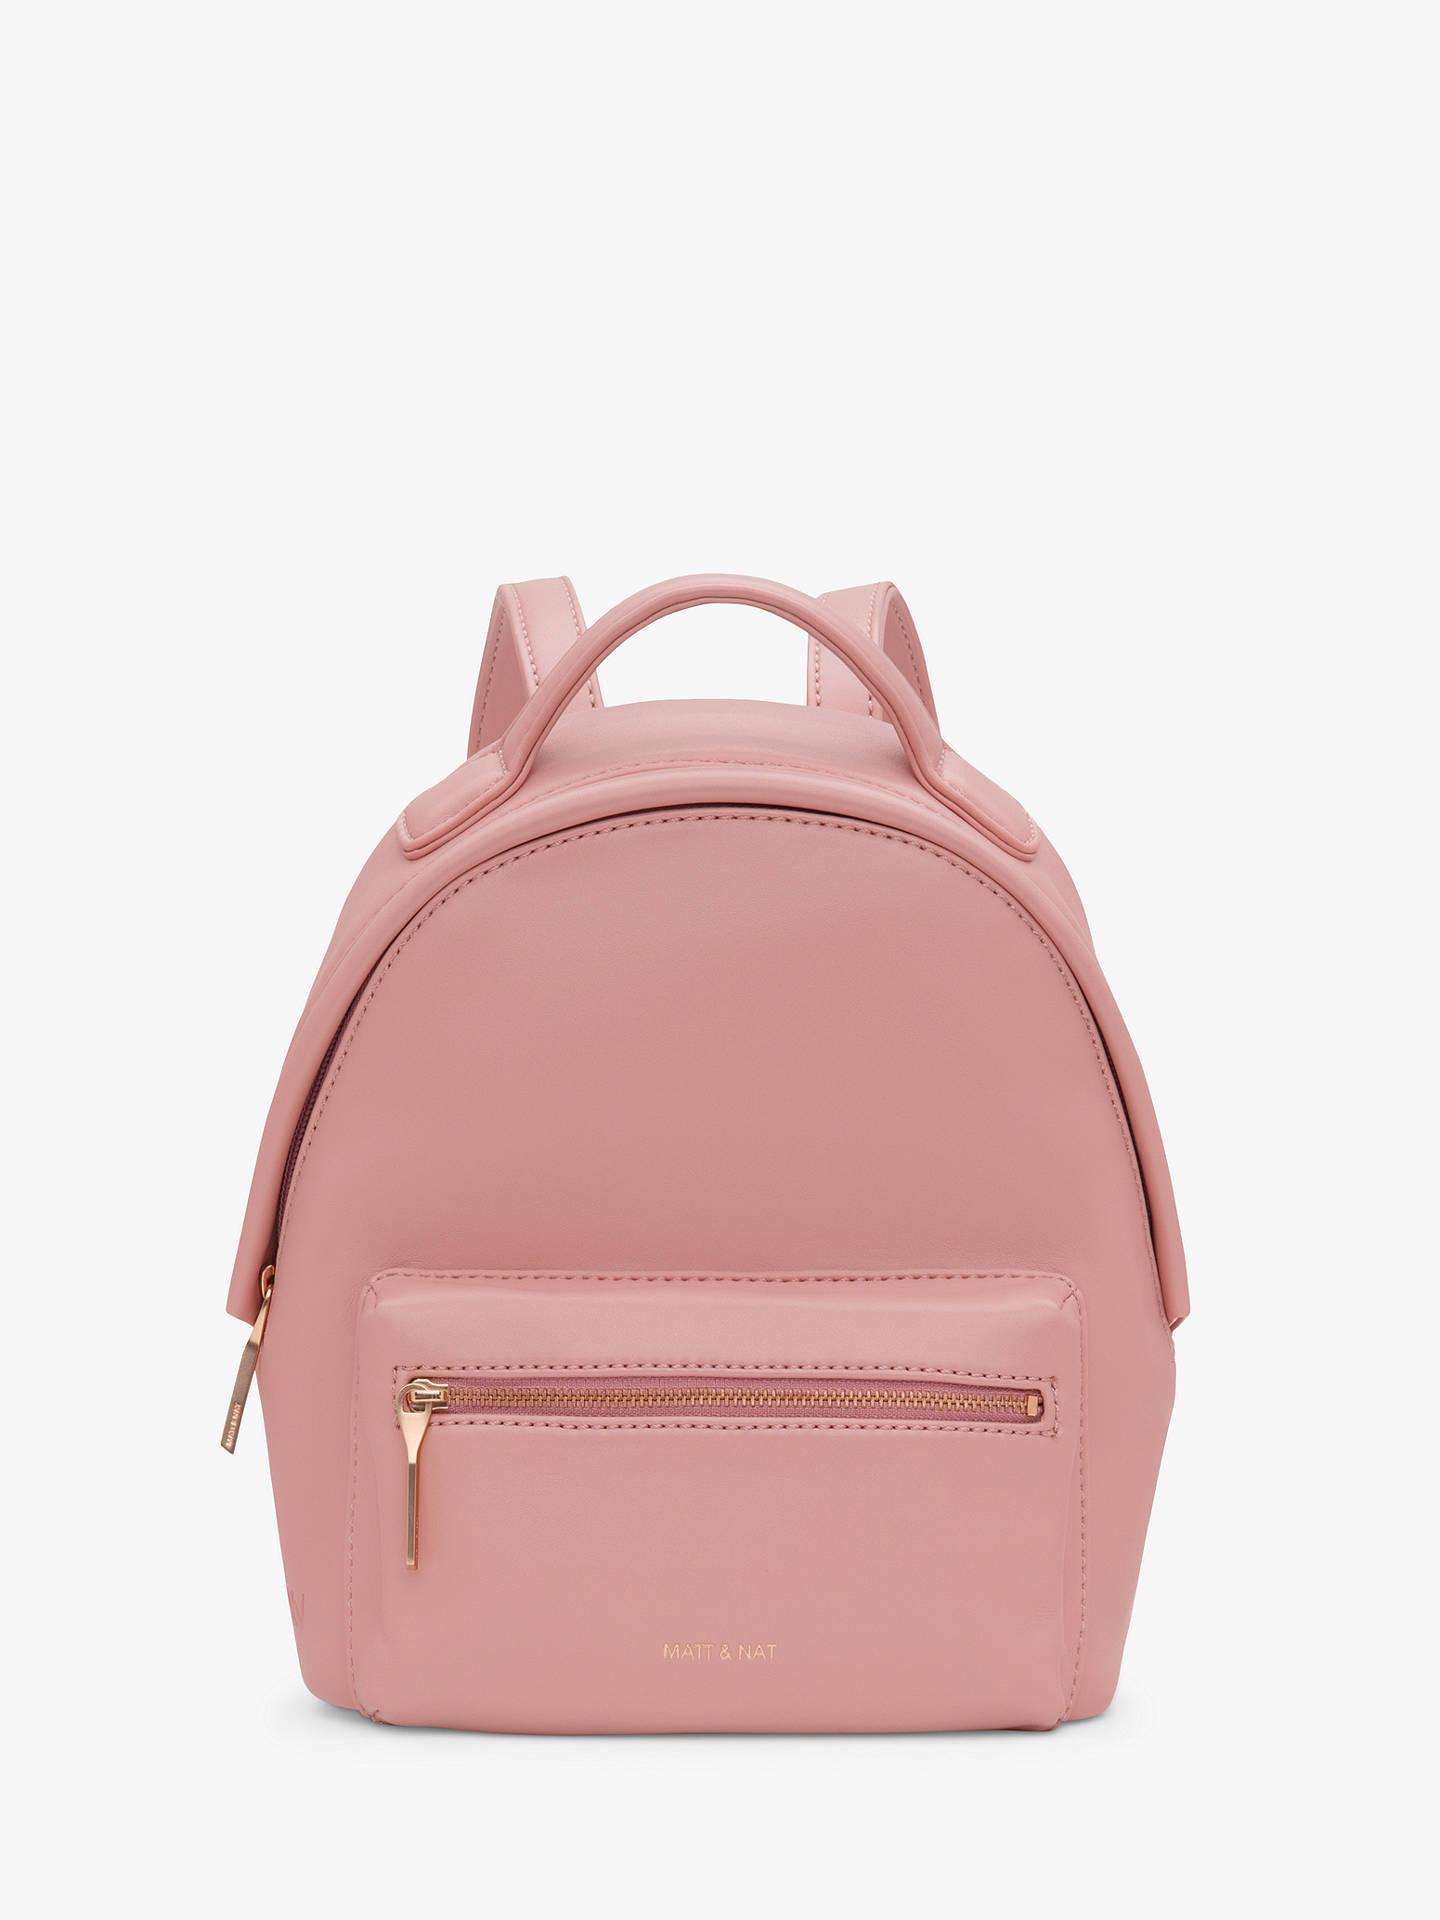 372d13b9907 Buy Matt & Nat Loom Collection Bali Vegan Mini Backpack, Lily Online at  johnlewis.